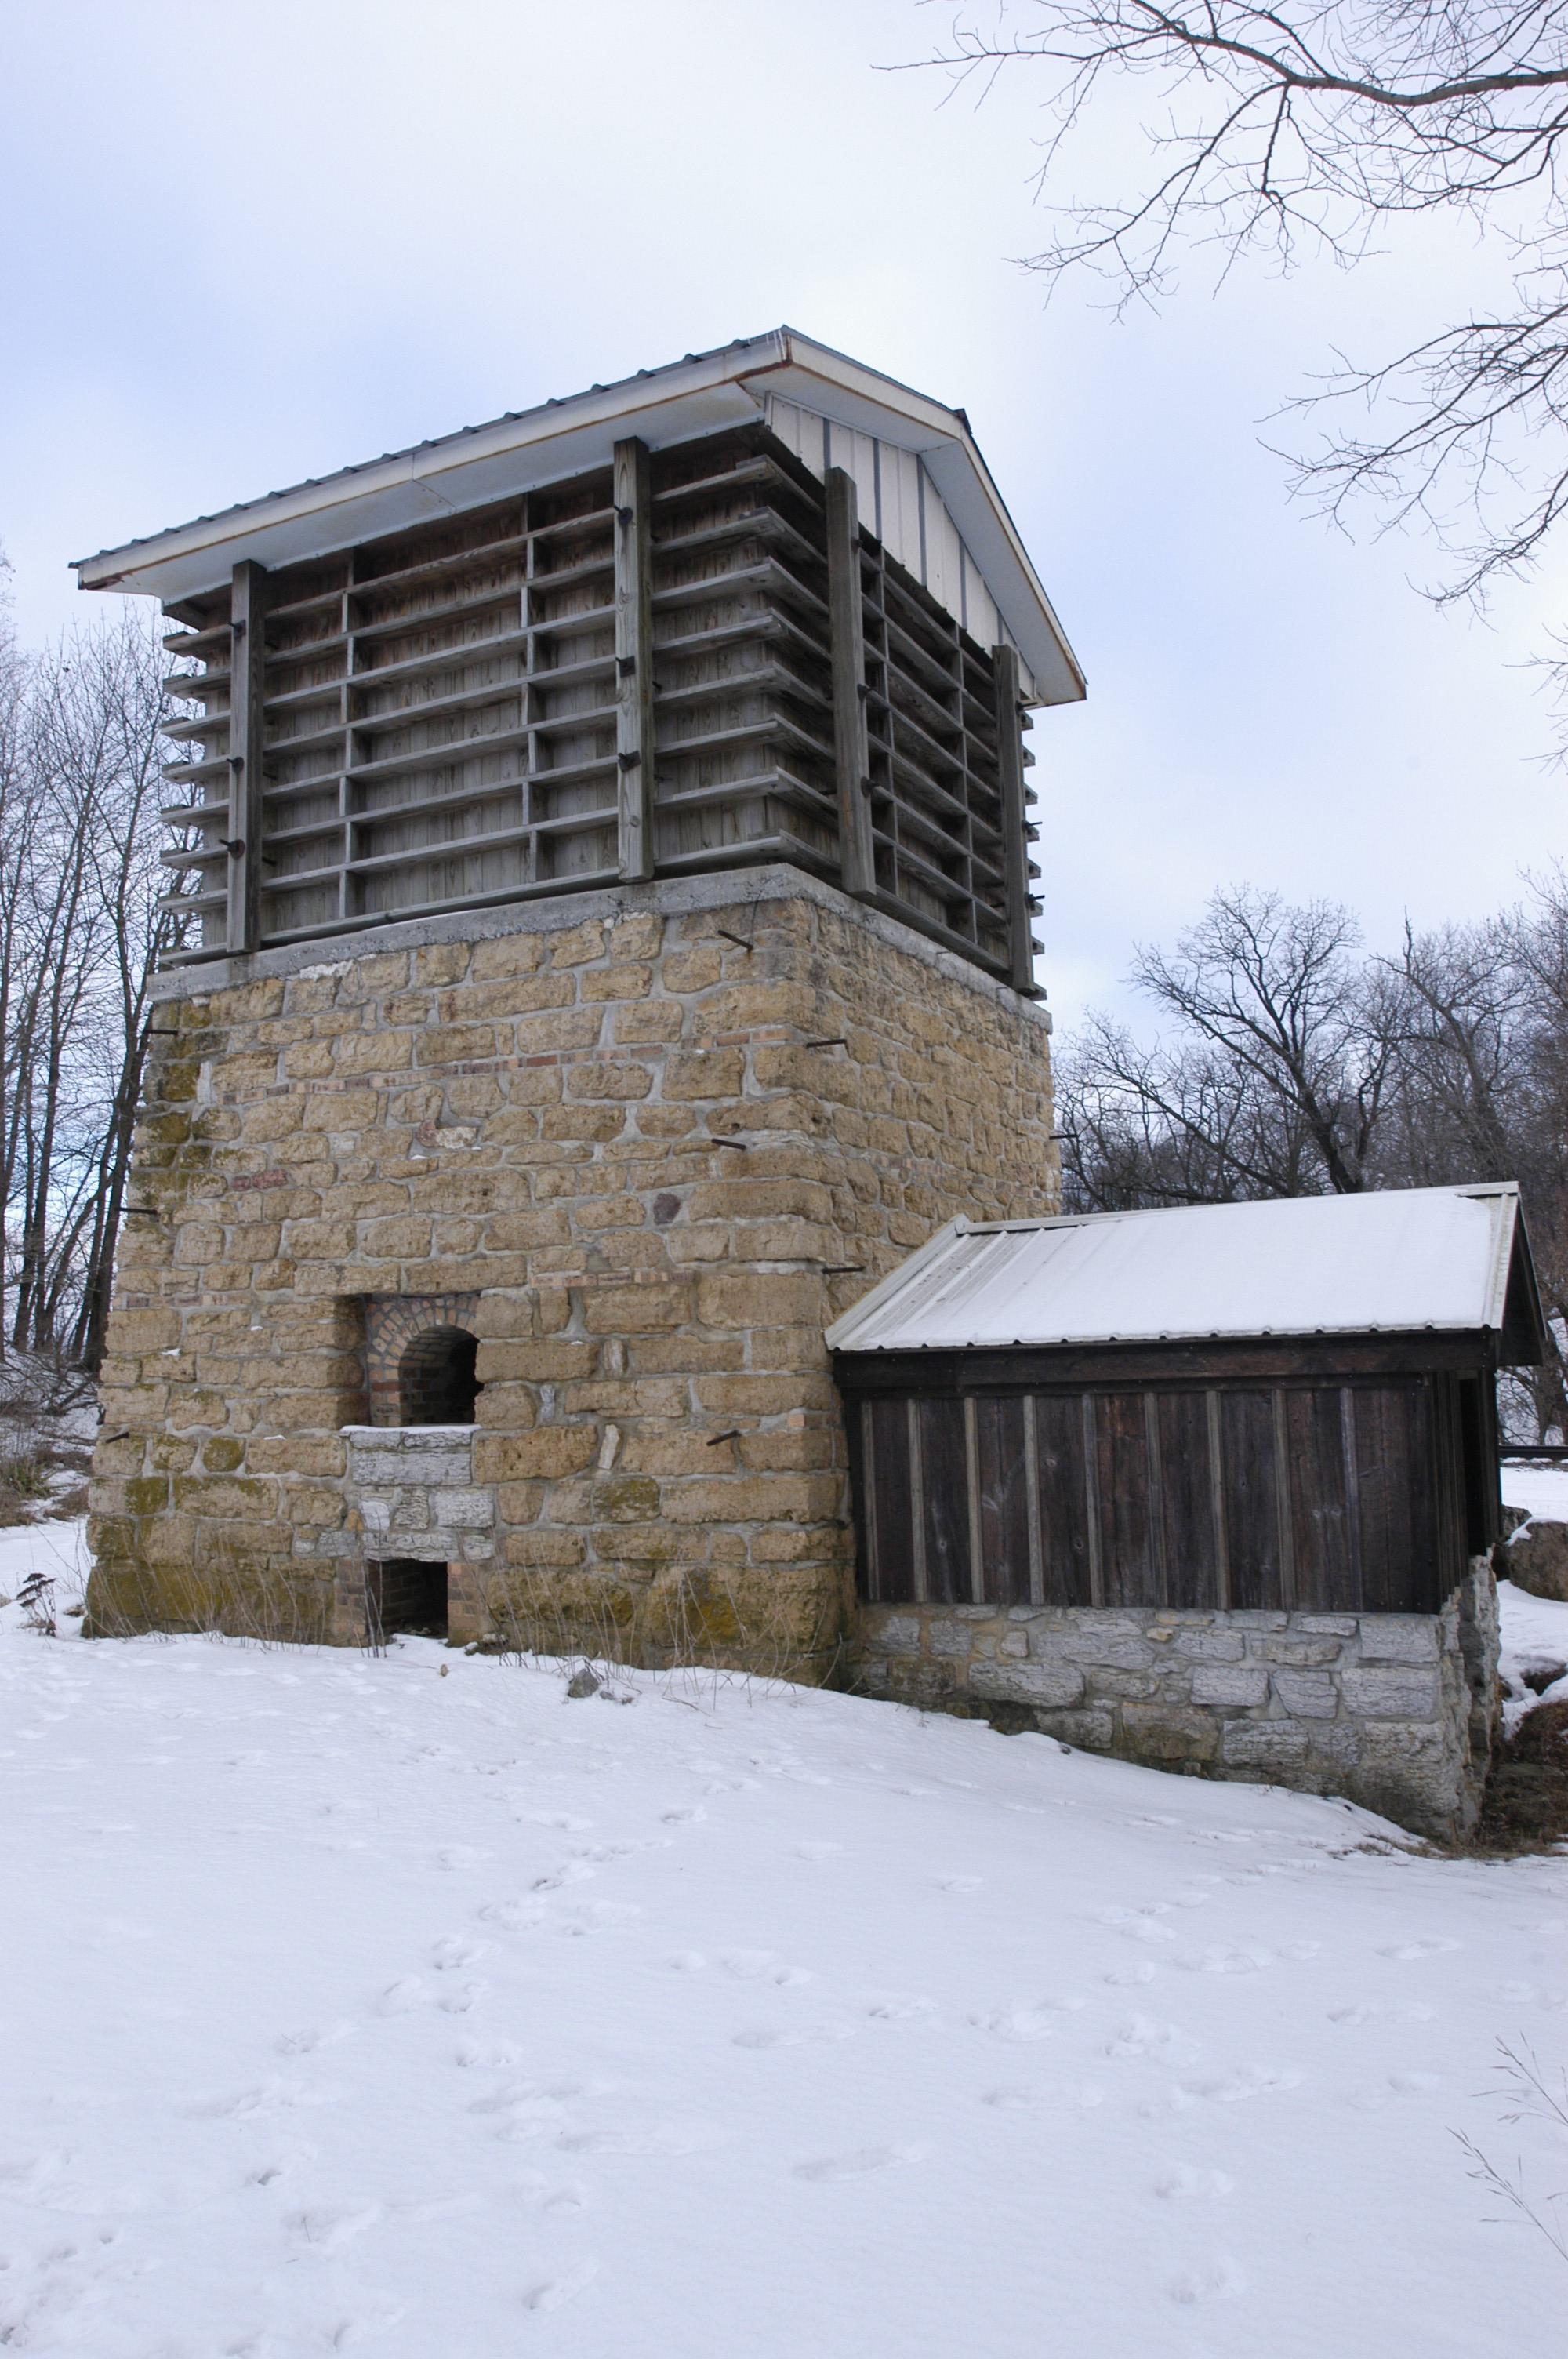 Illinois ogle county polo - File Ogle County Buffalo Grove Lime Kiln Polo Il3 Jpg